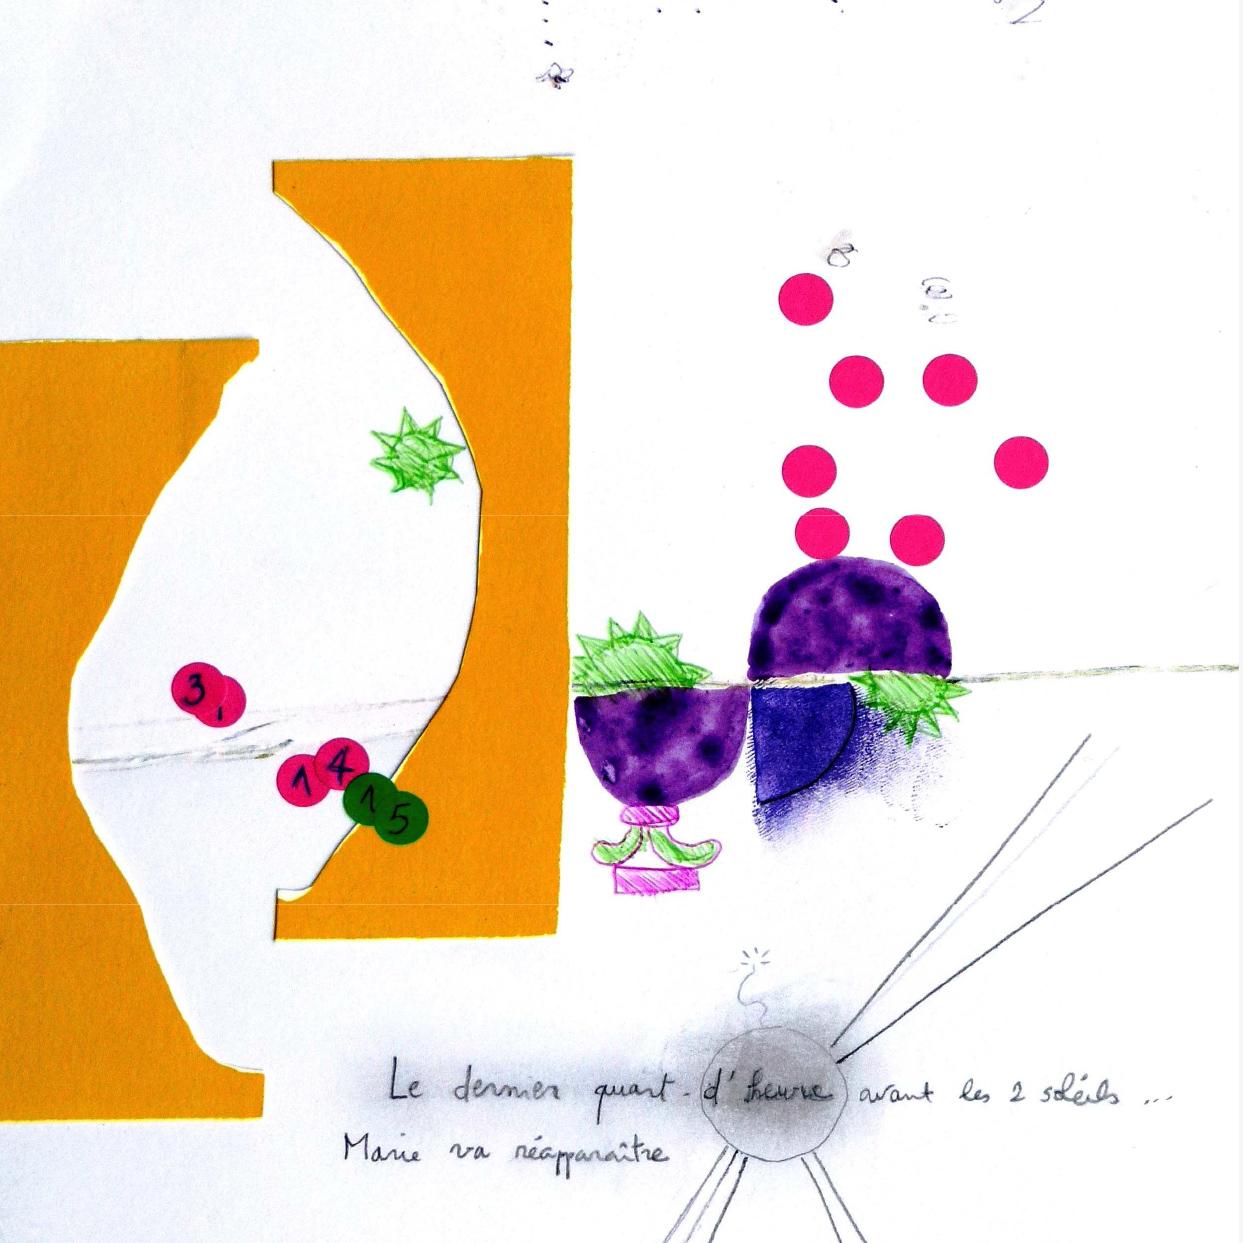 La-Dispersion-et-la-Soif-DDJP-GalMCD-Invitation.pub